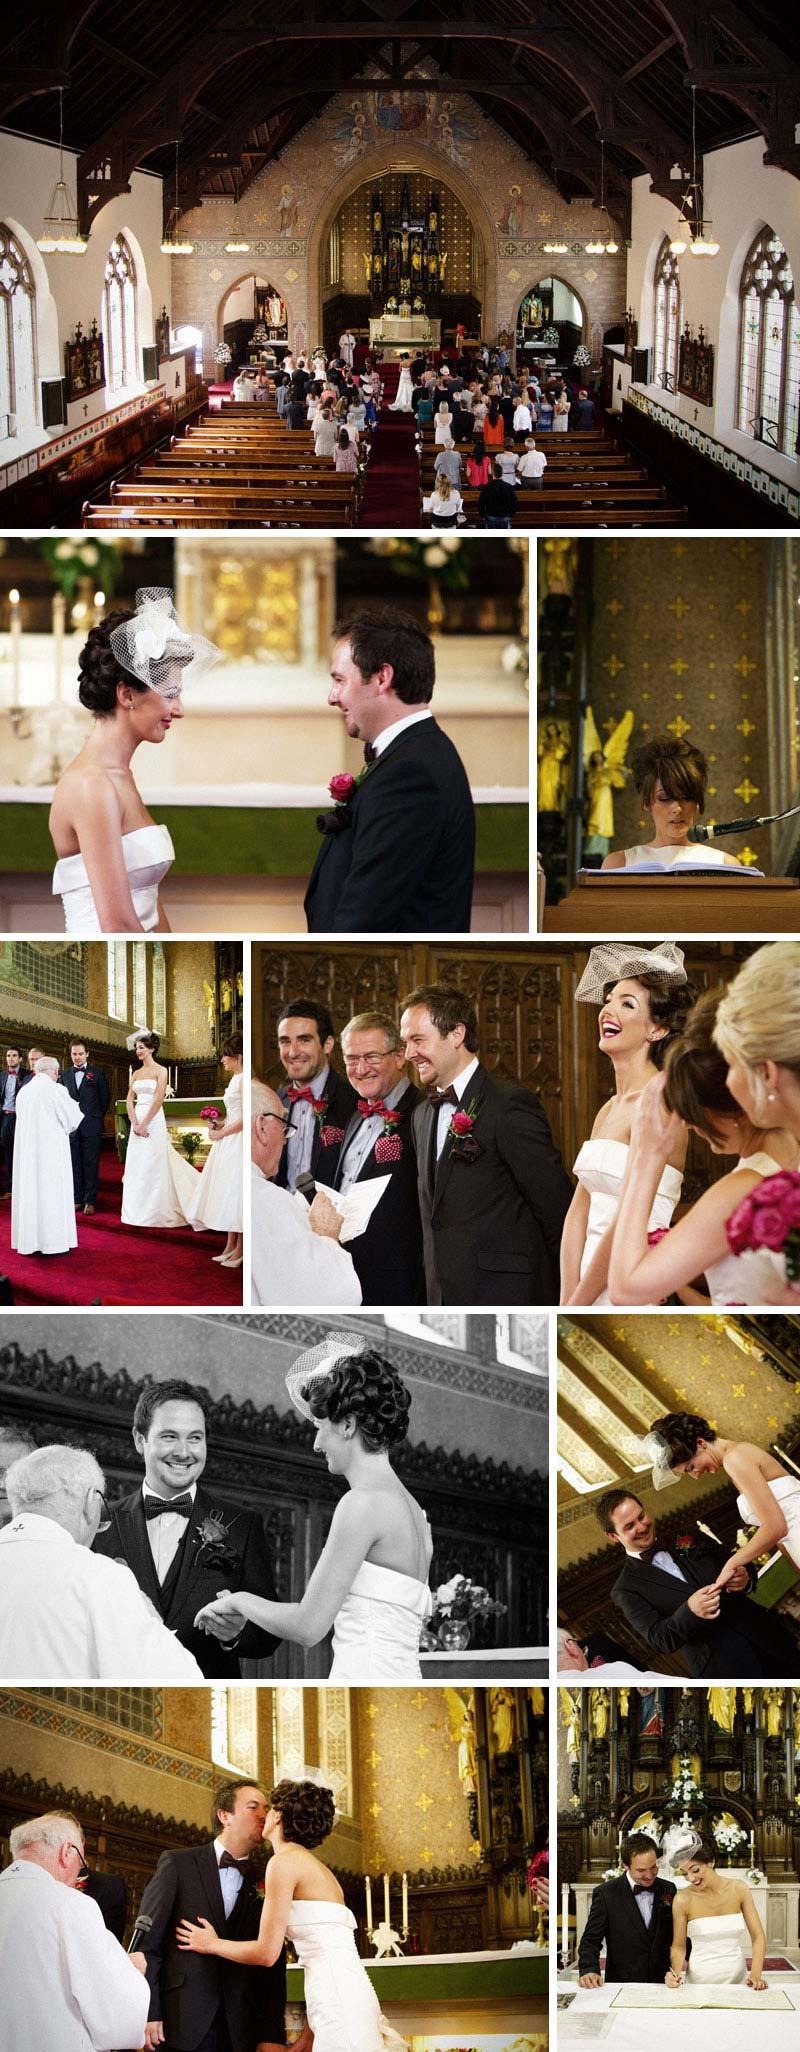 Wedding Photographer great john street